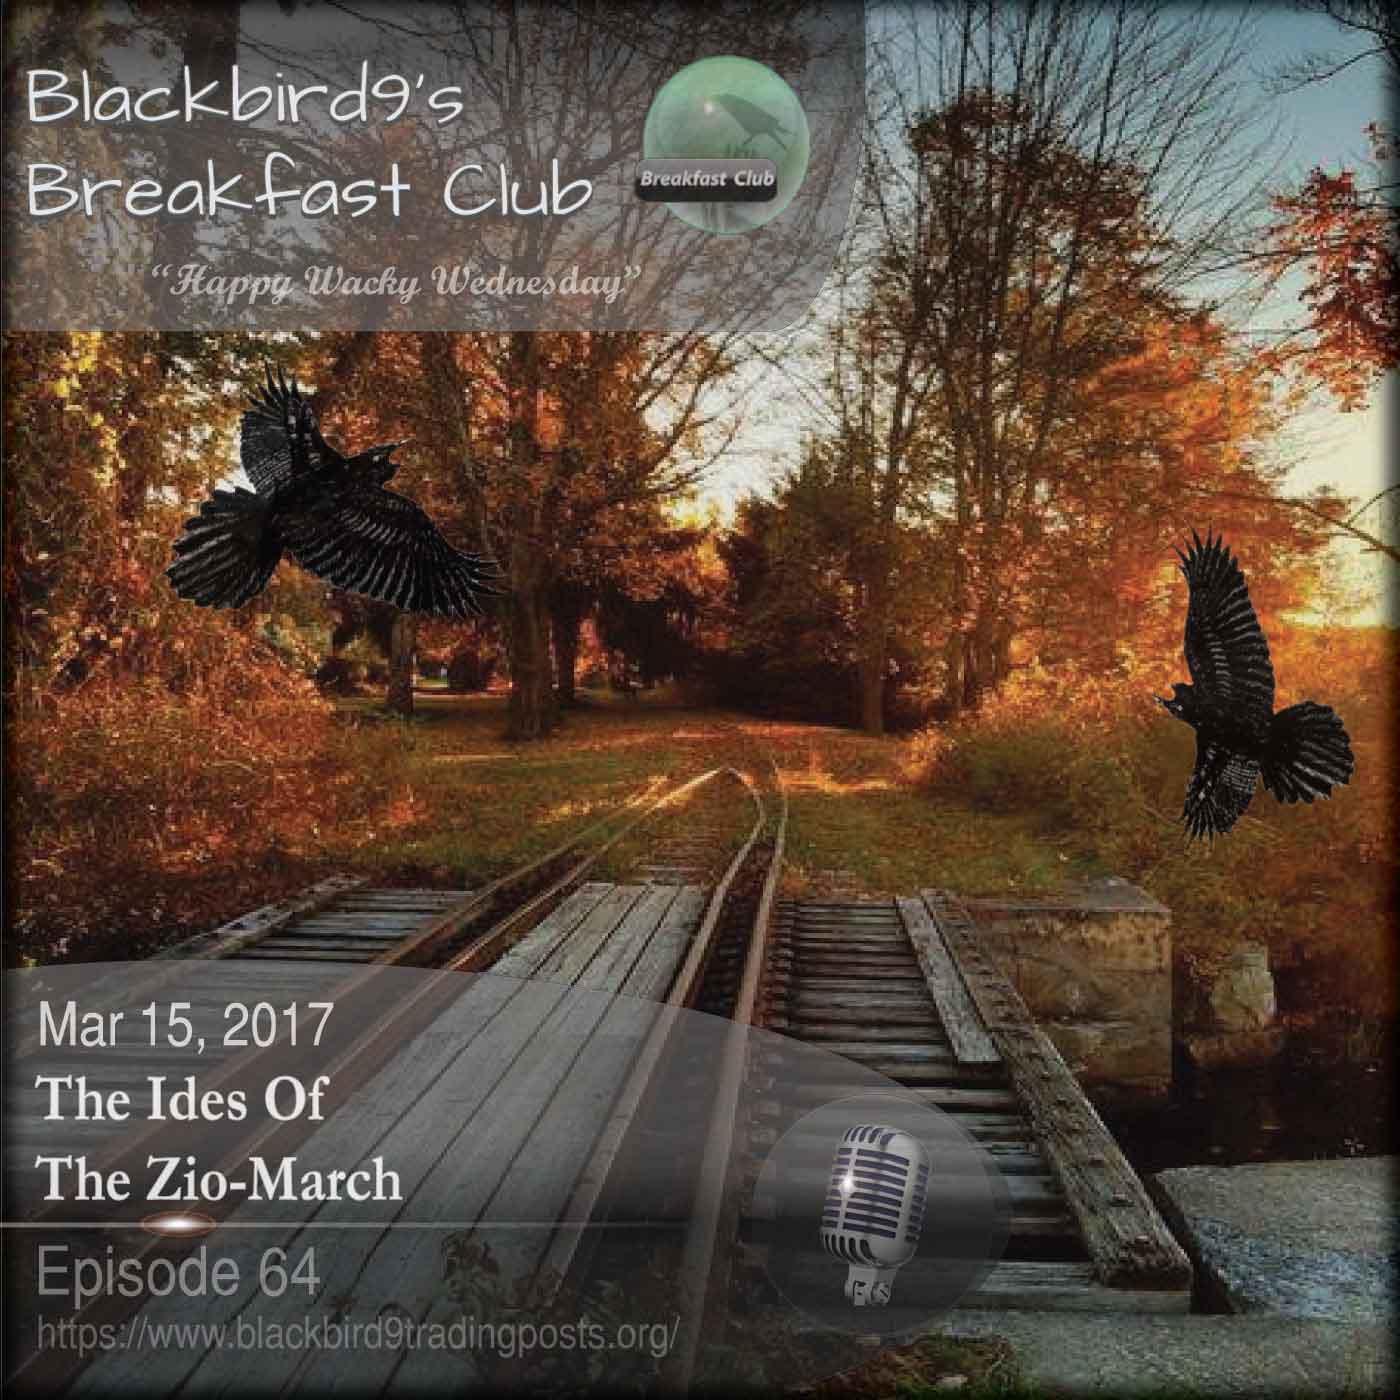 The Ides Of The Zio-March - Blackbird9